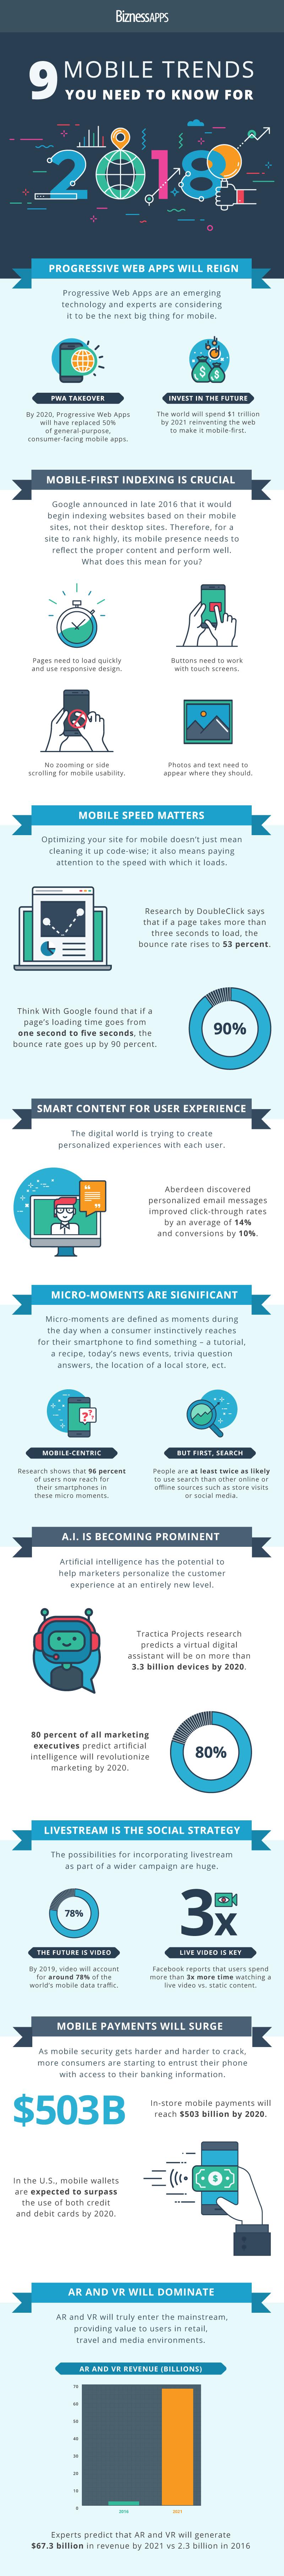 9 Tendencias de marketing móvil que debe saber para 2018 [Infographic] | Social Media Today